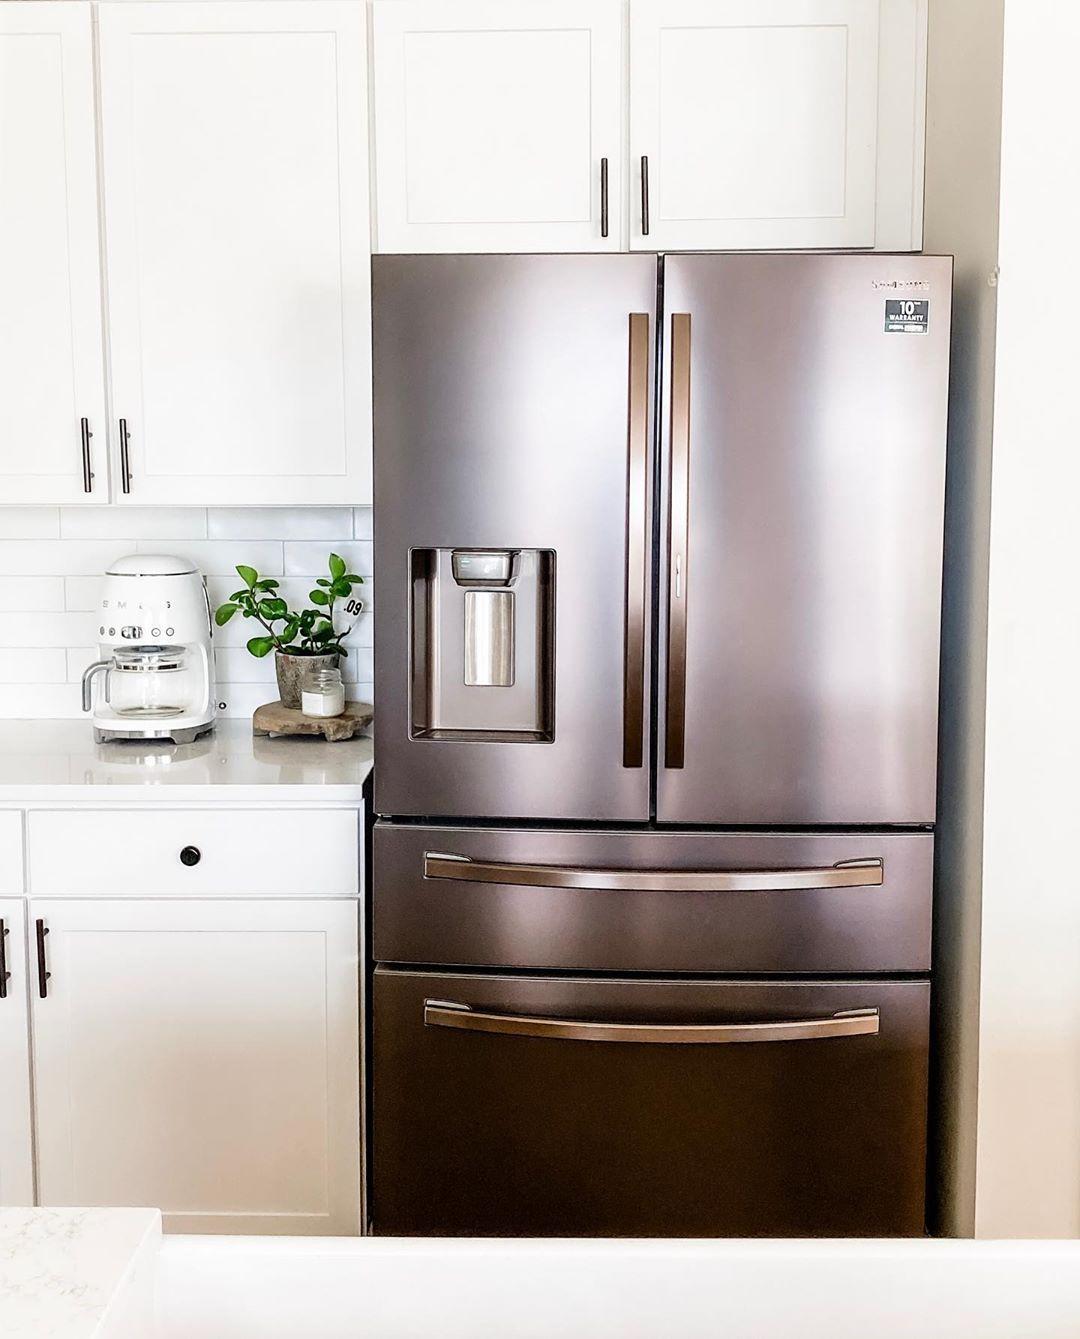 Download Wallpaper White Or Silver Kitchen Appliances